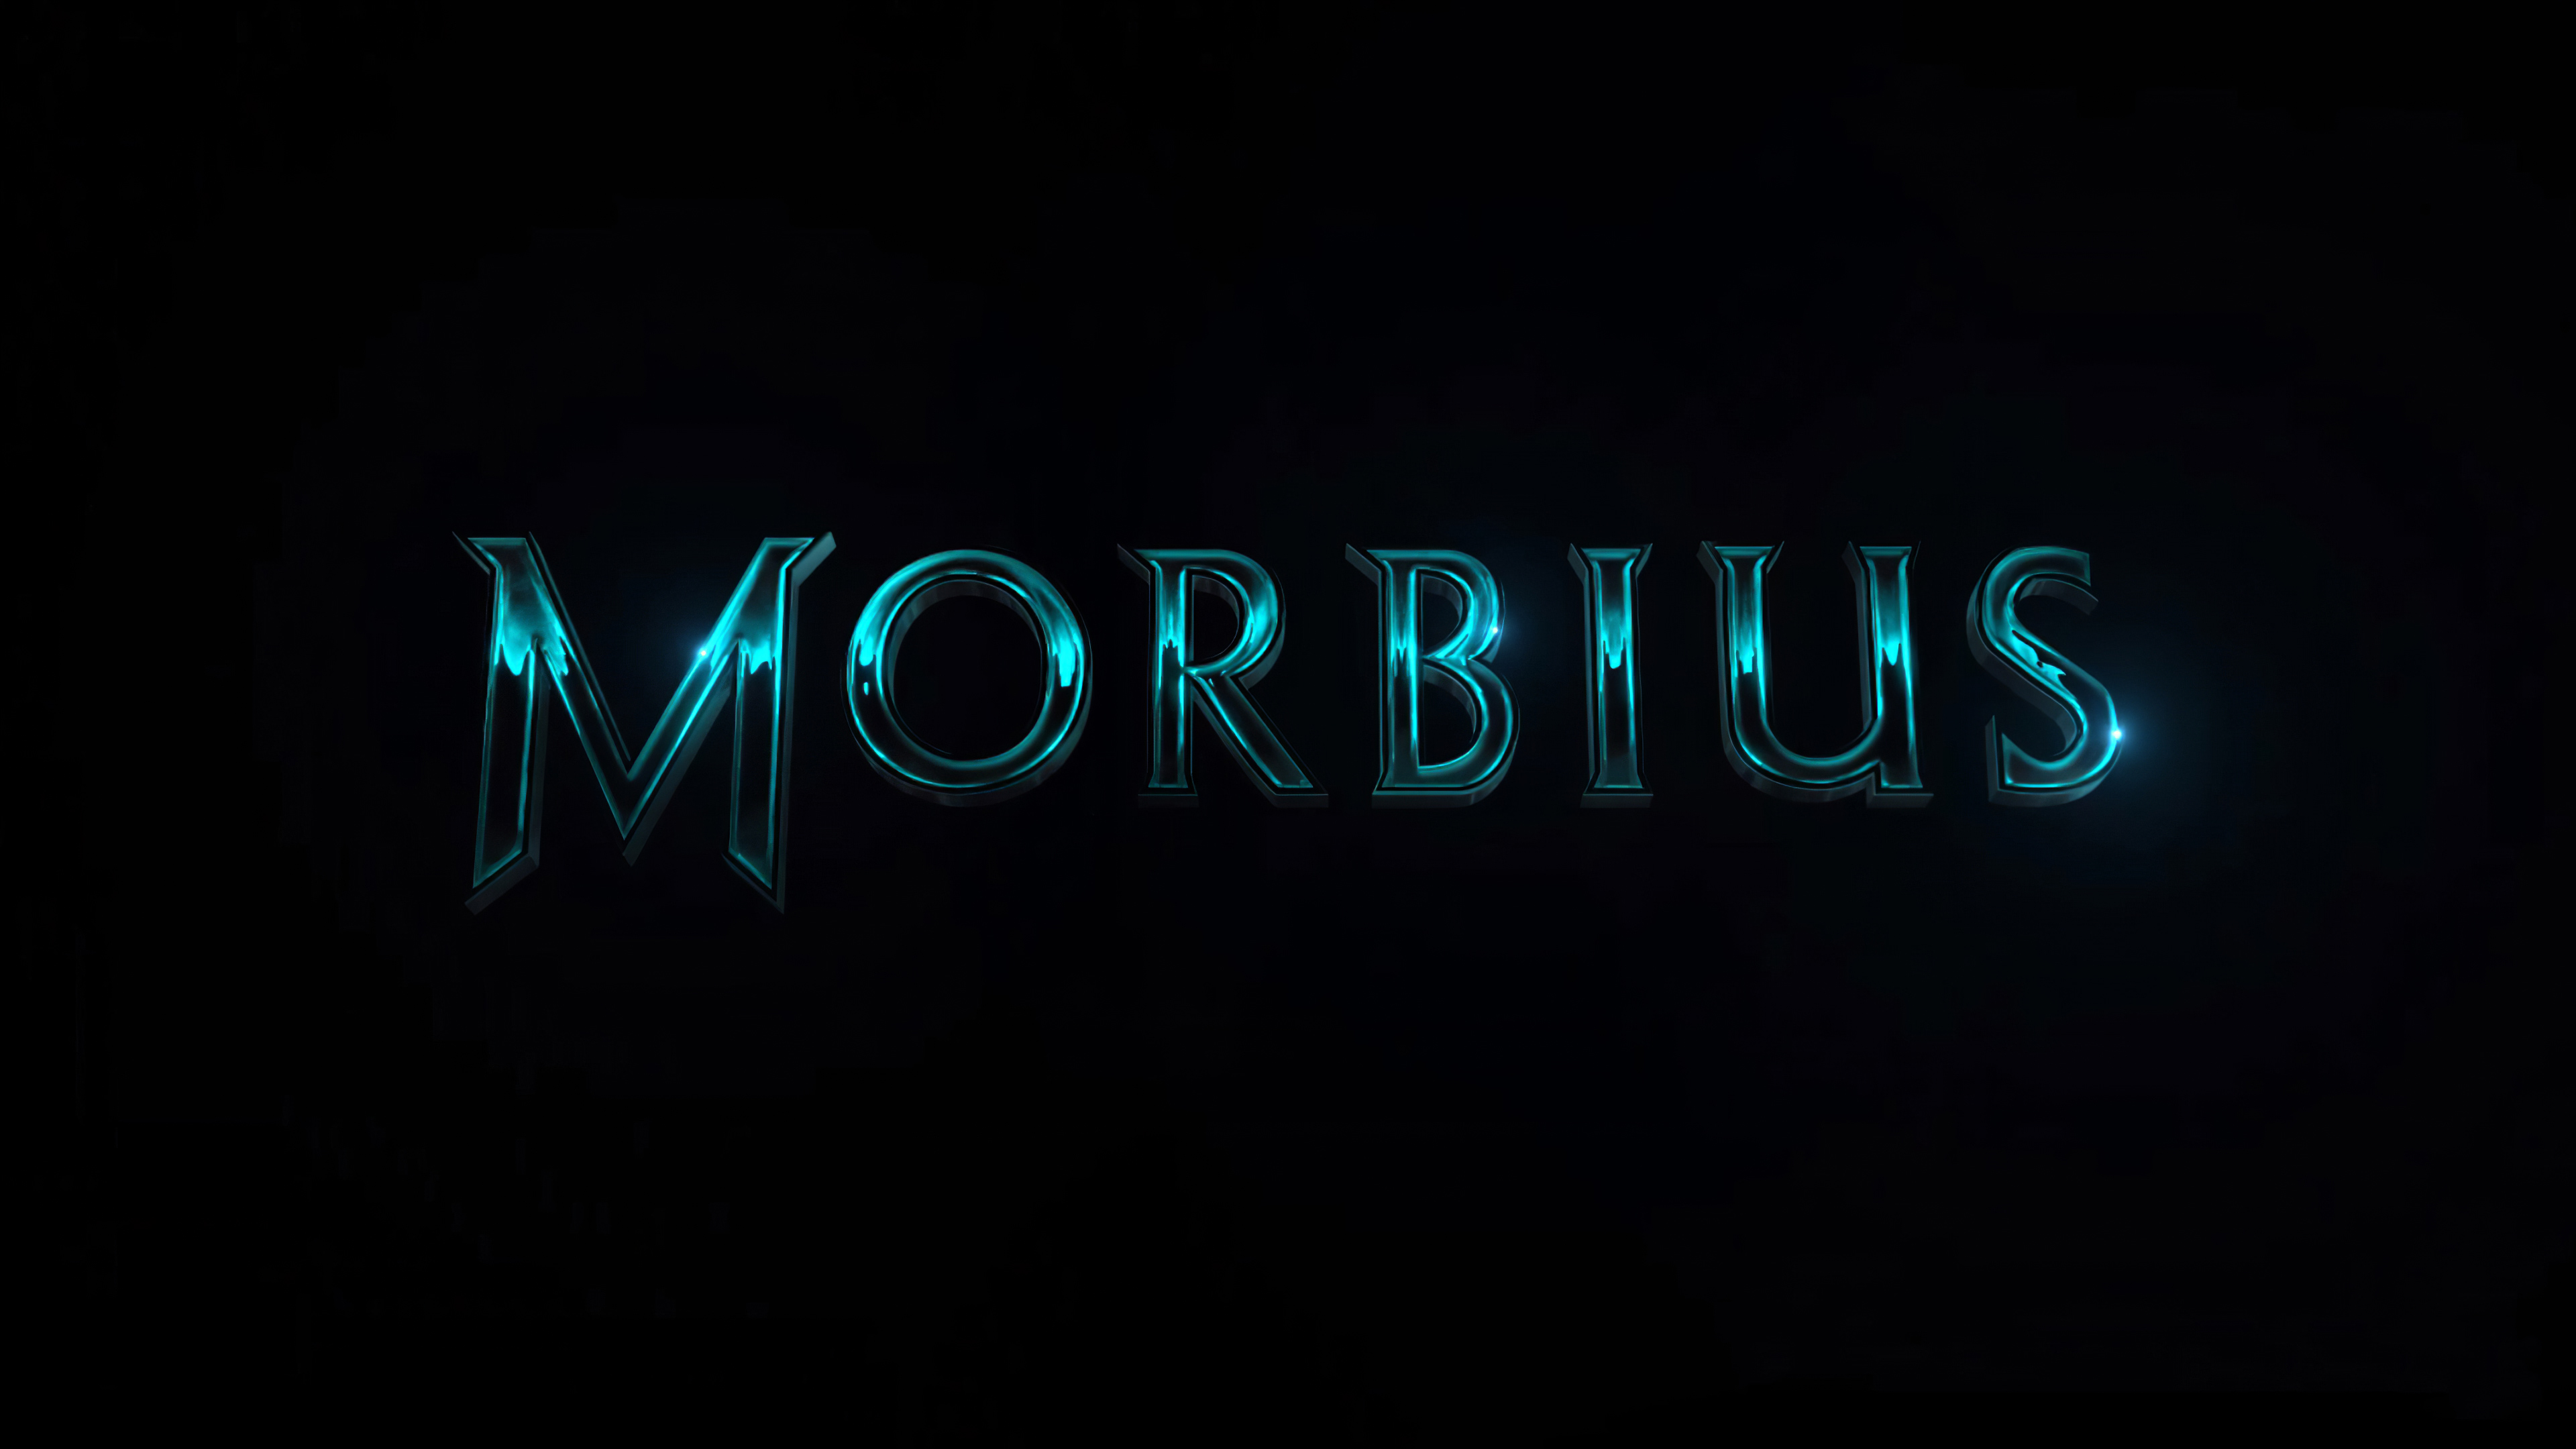 morbius 2020 logo 1579648517 - Morbius 2020 Logo - Morbius 2020 Logo wallpapers 4k, Morbius 2020 Logo 4k